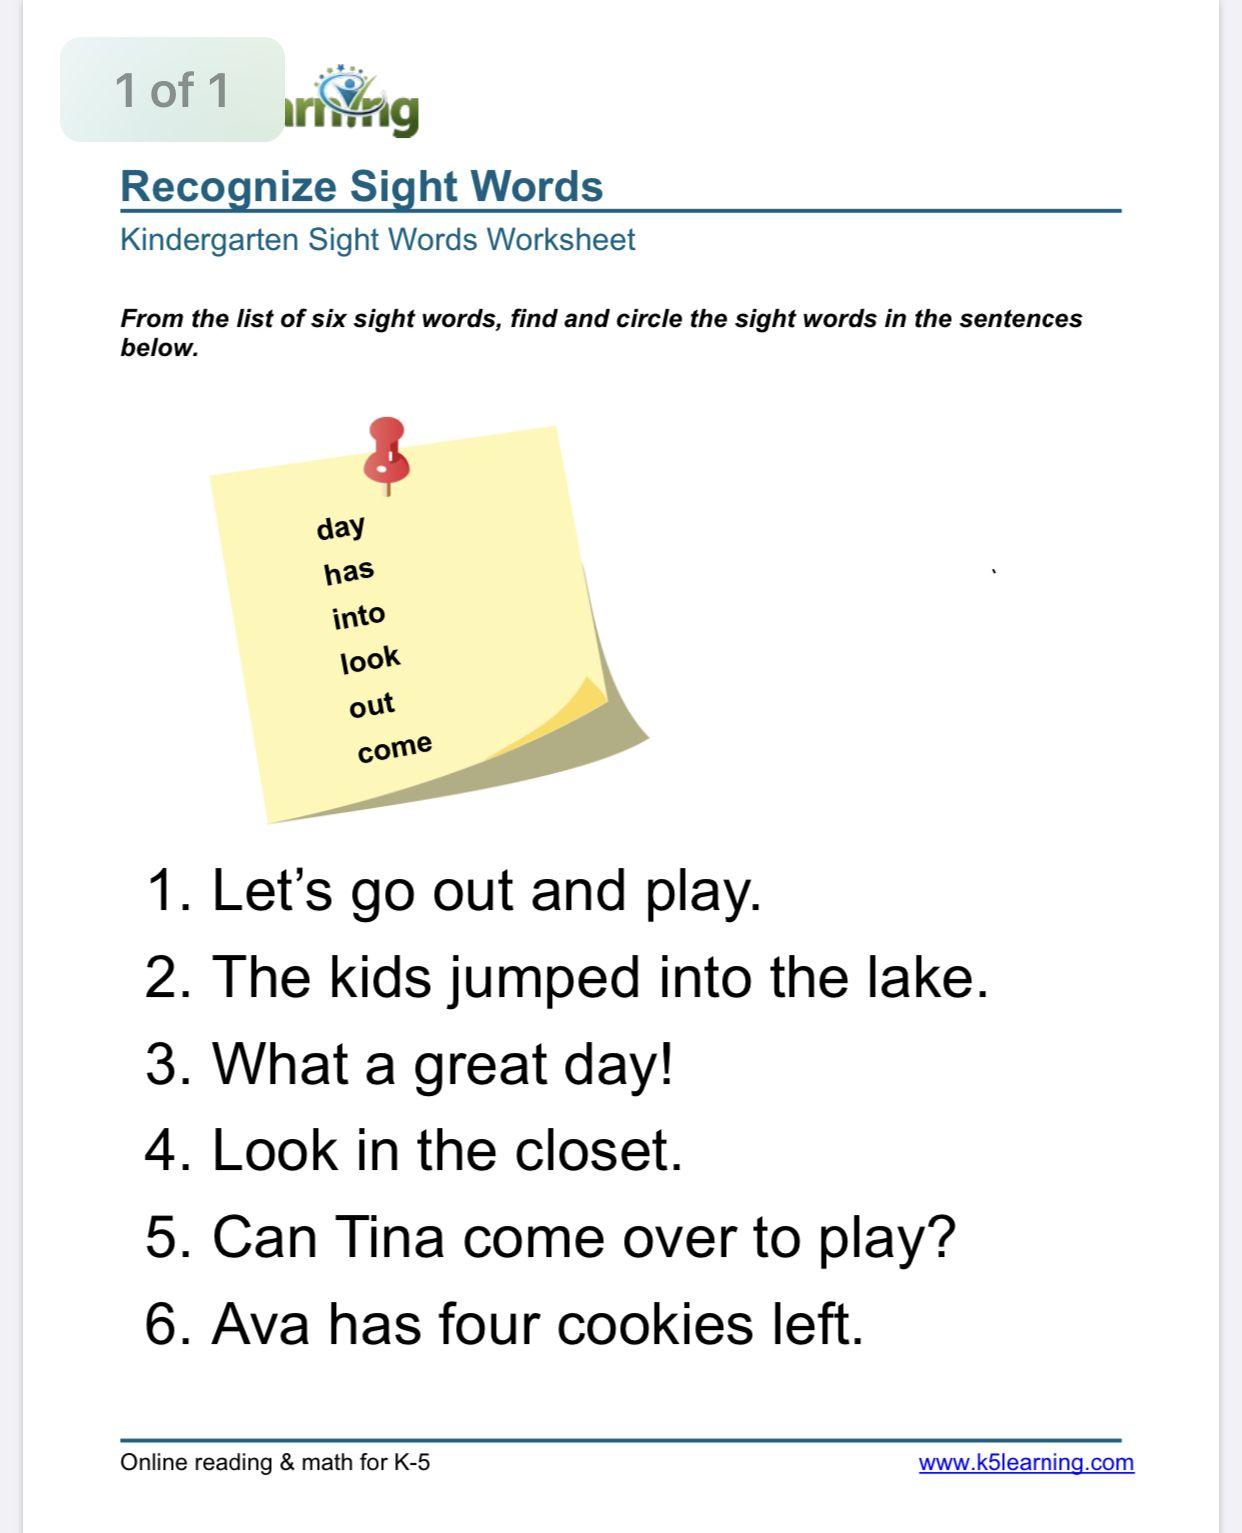 Sight Words In Sentances Worksheet